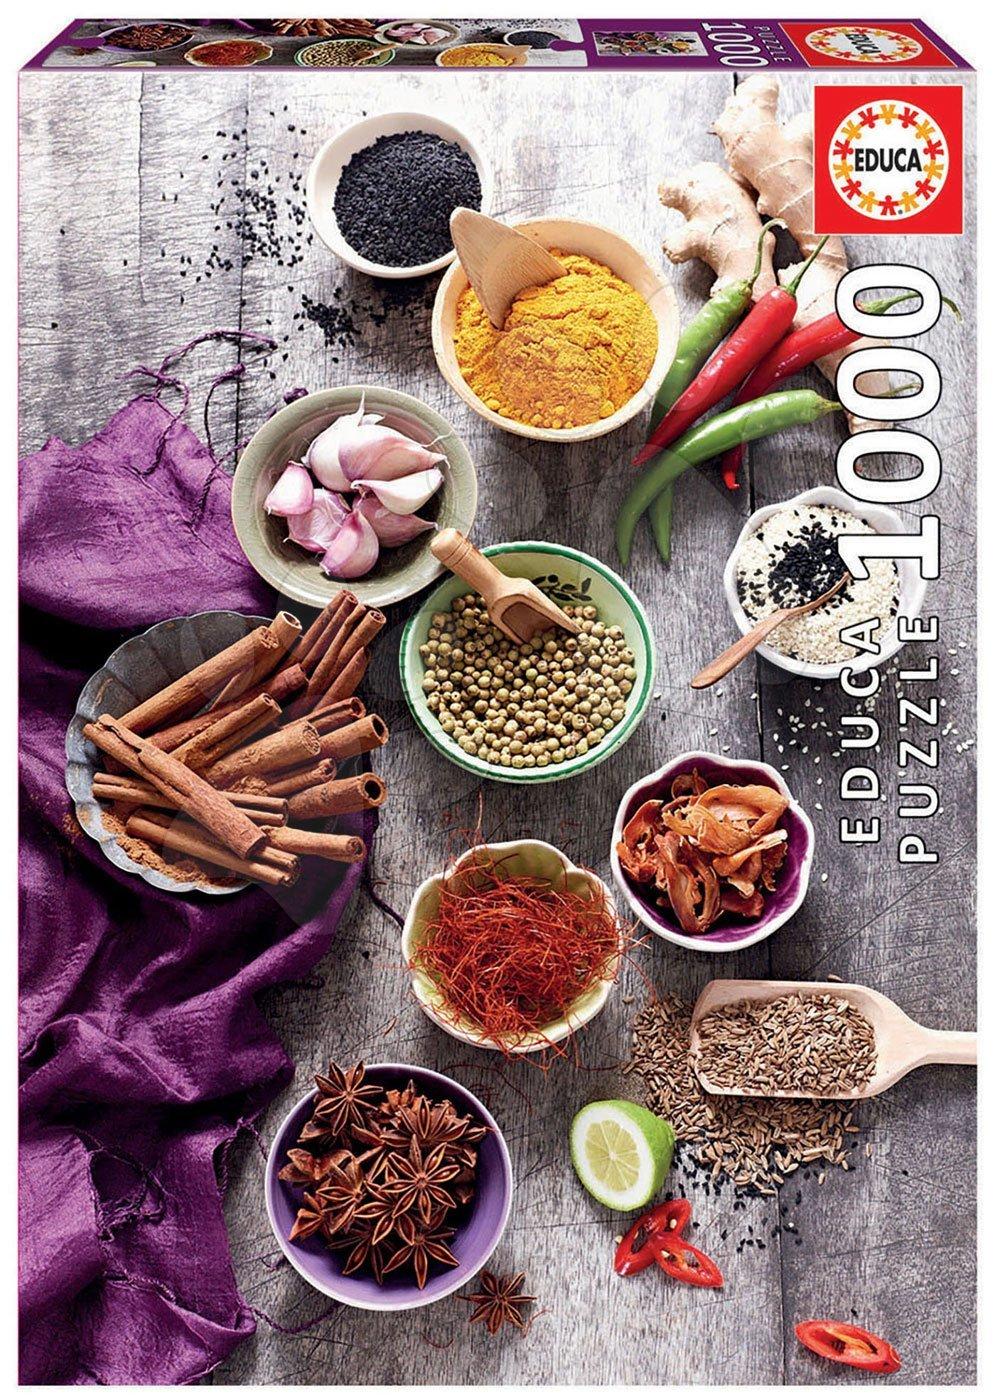 Puzzle Assorted Spices Educa 1000 piese și lipici Fix puzzle de la 11 ani